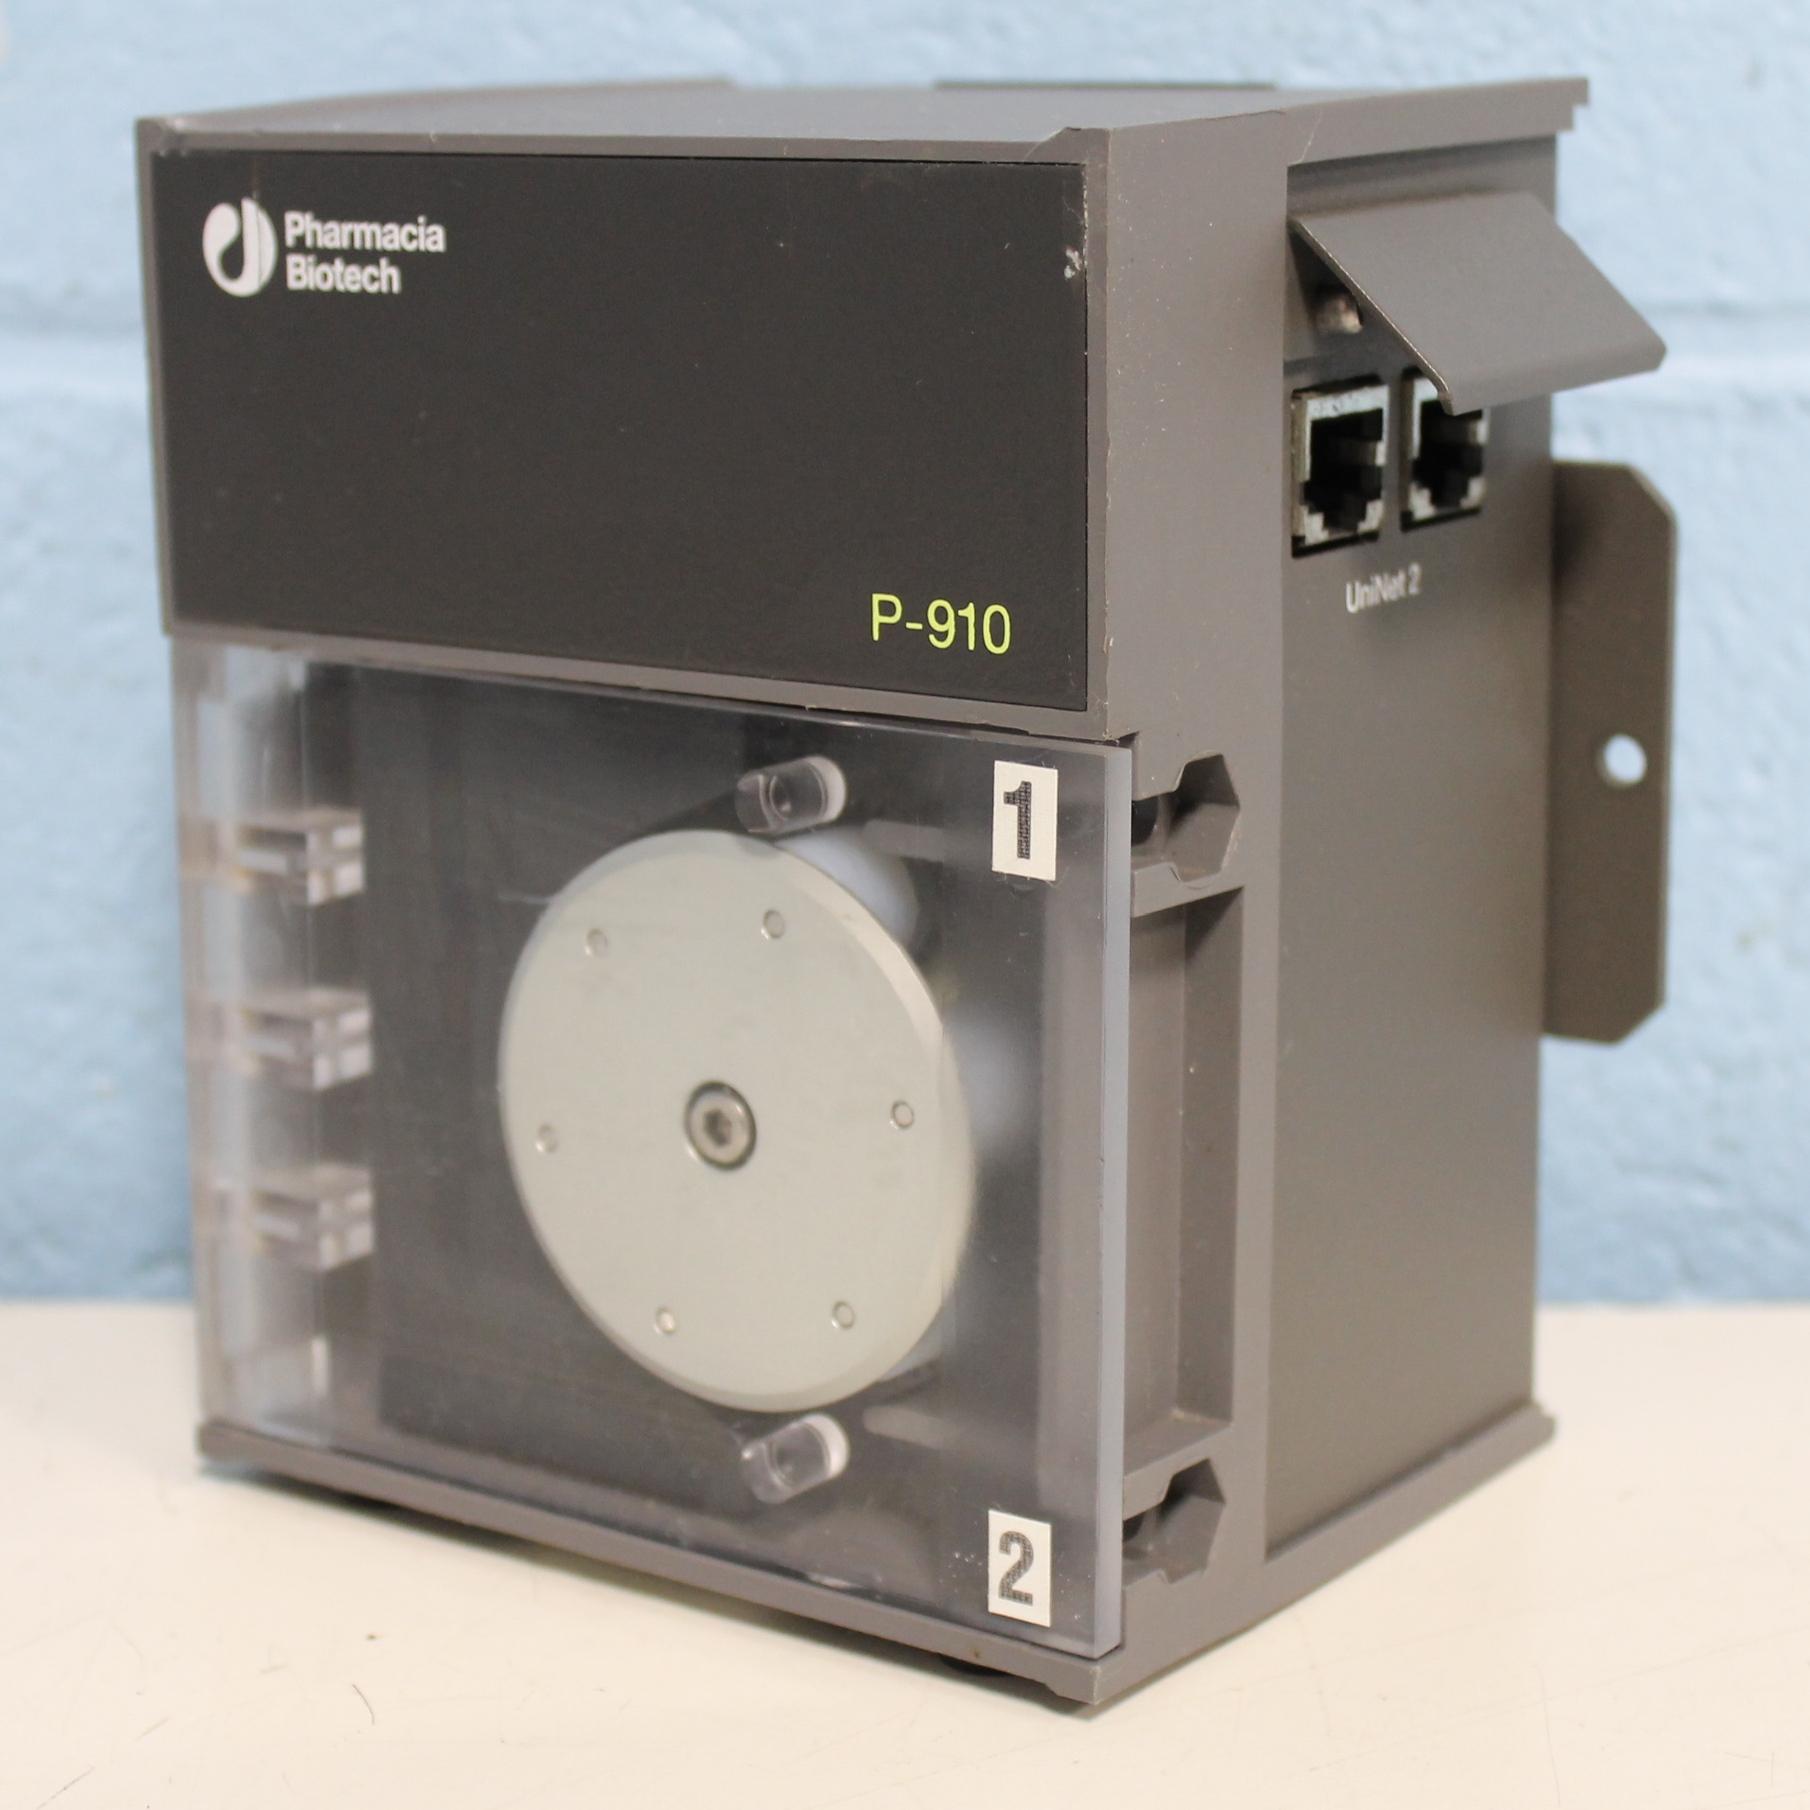 Pharmacia Biotech Peristaltic Pump P-910 Image